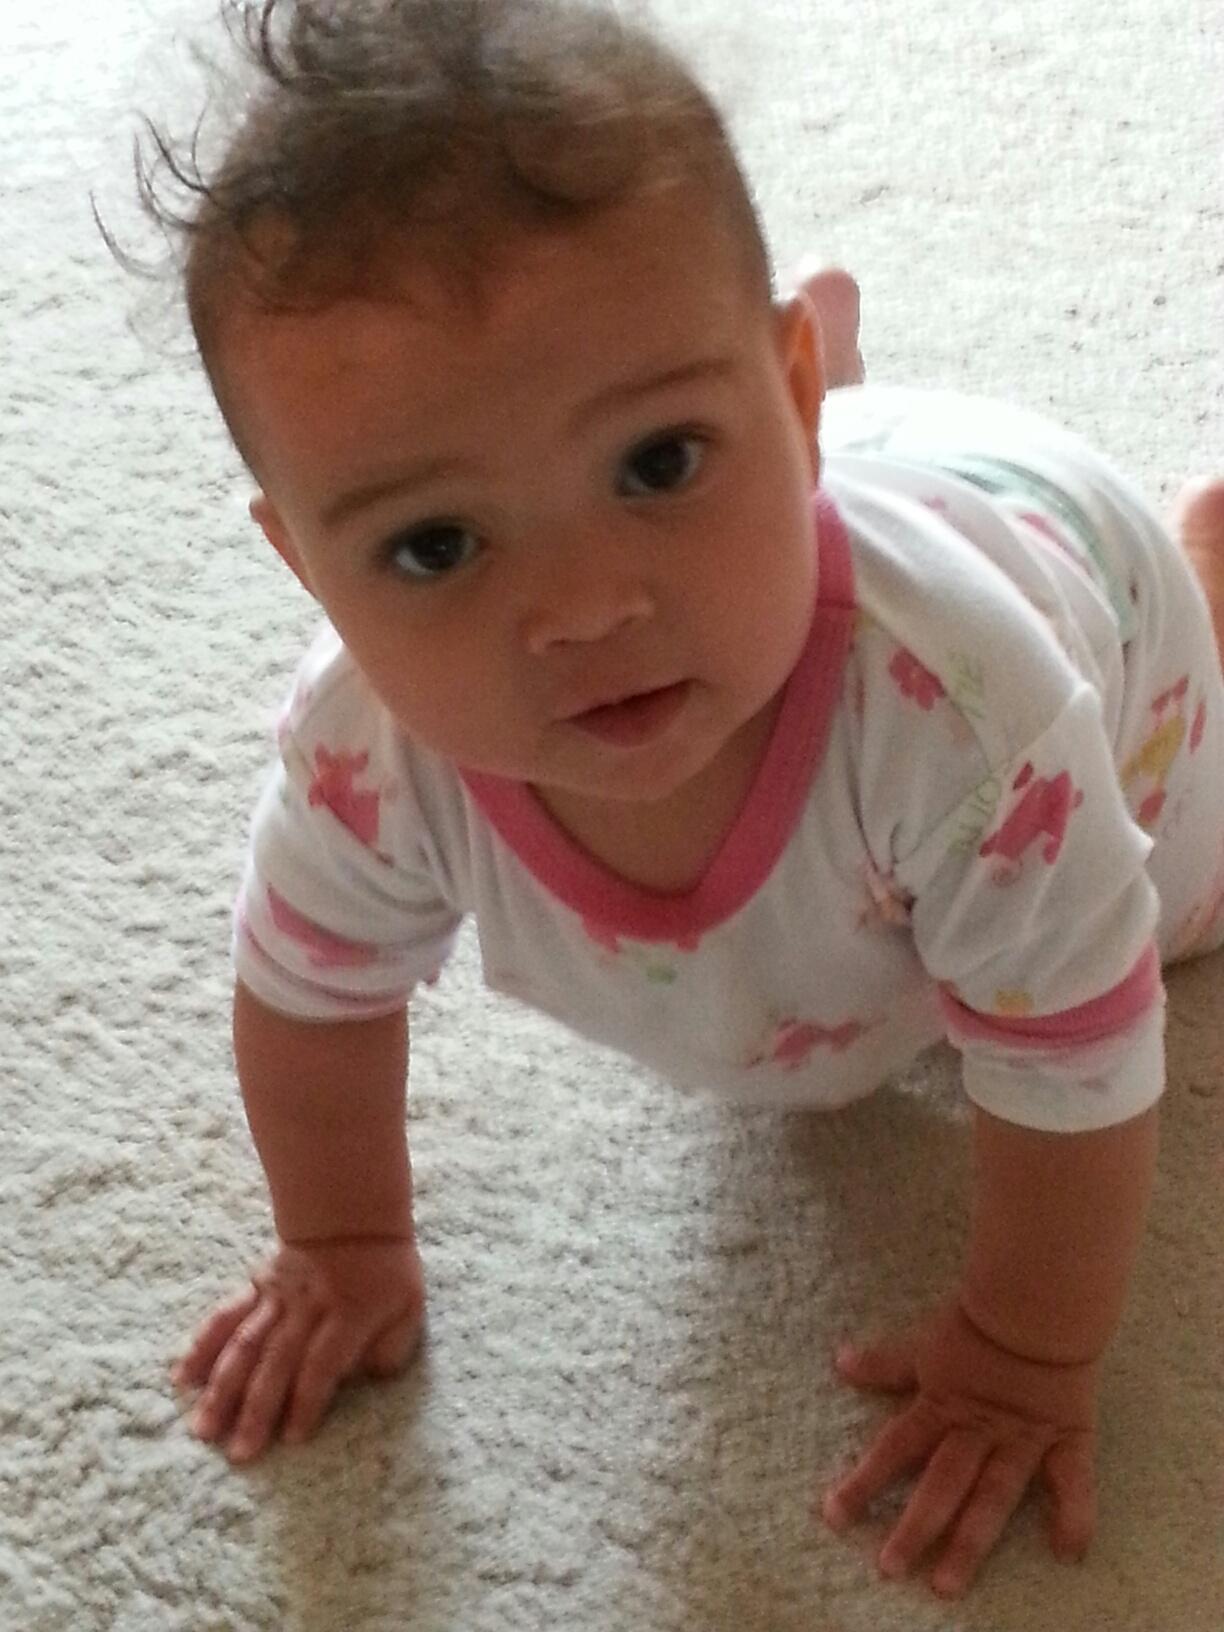 6 Months Going On 6 Years Postpartum Update